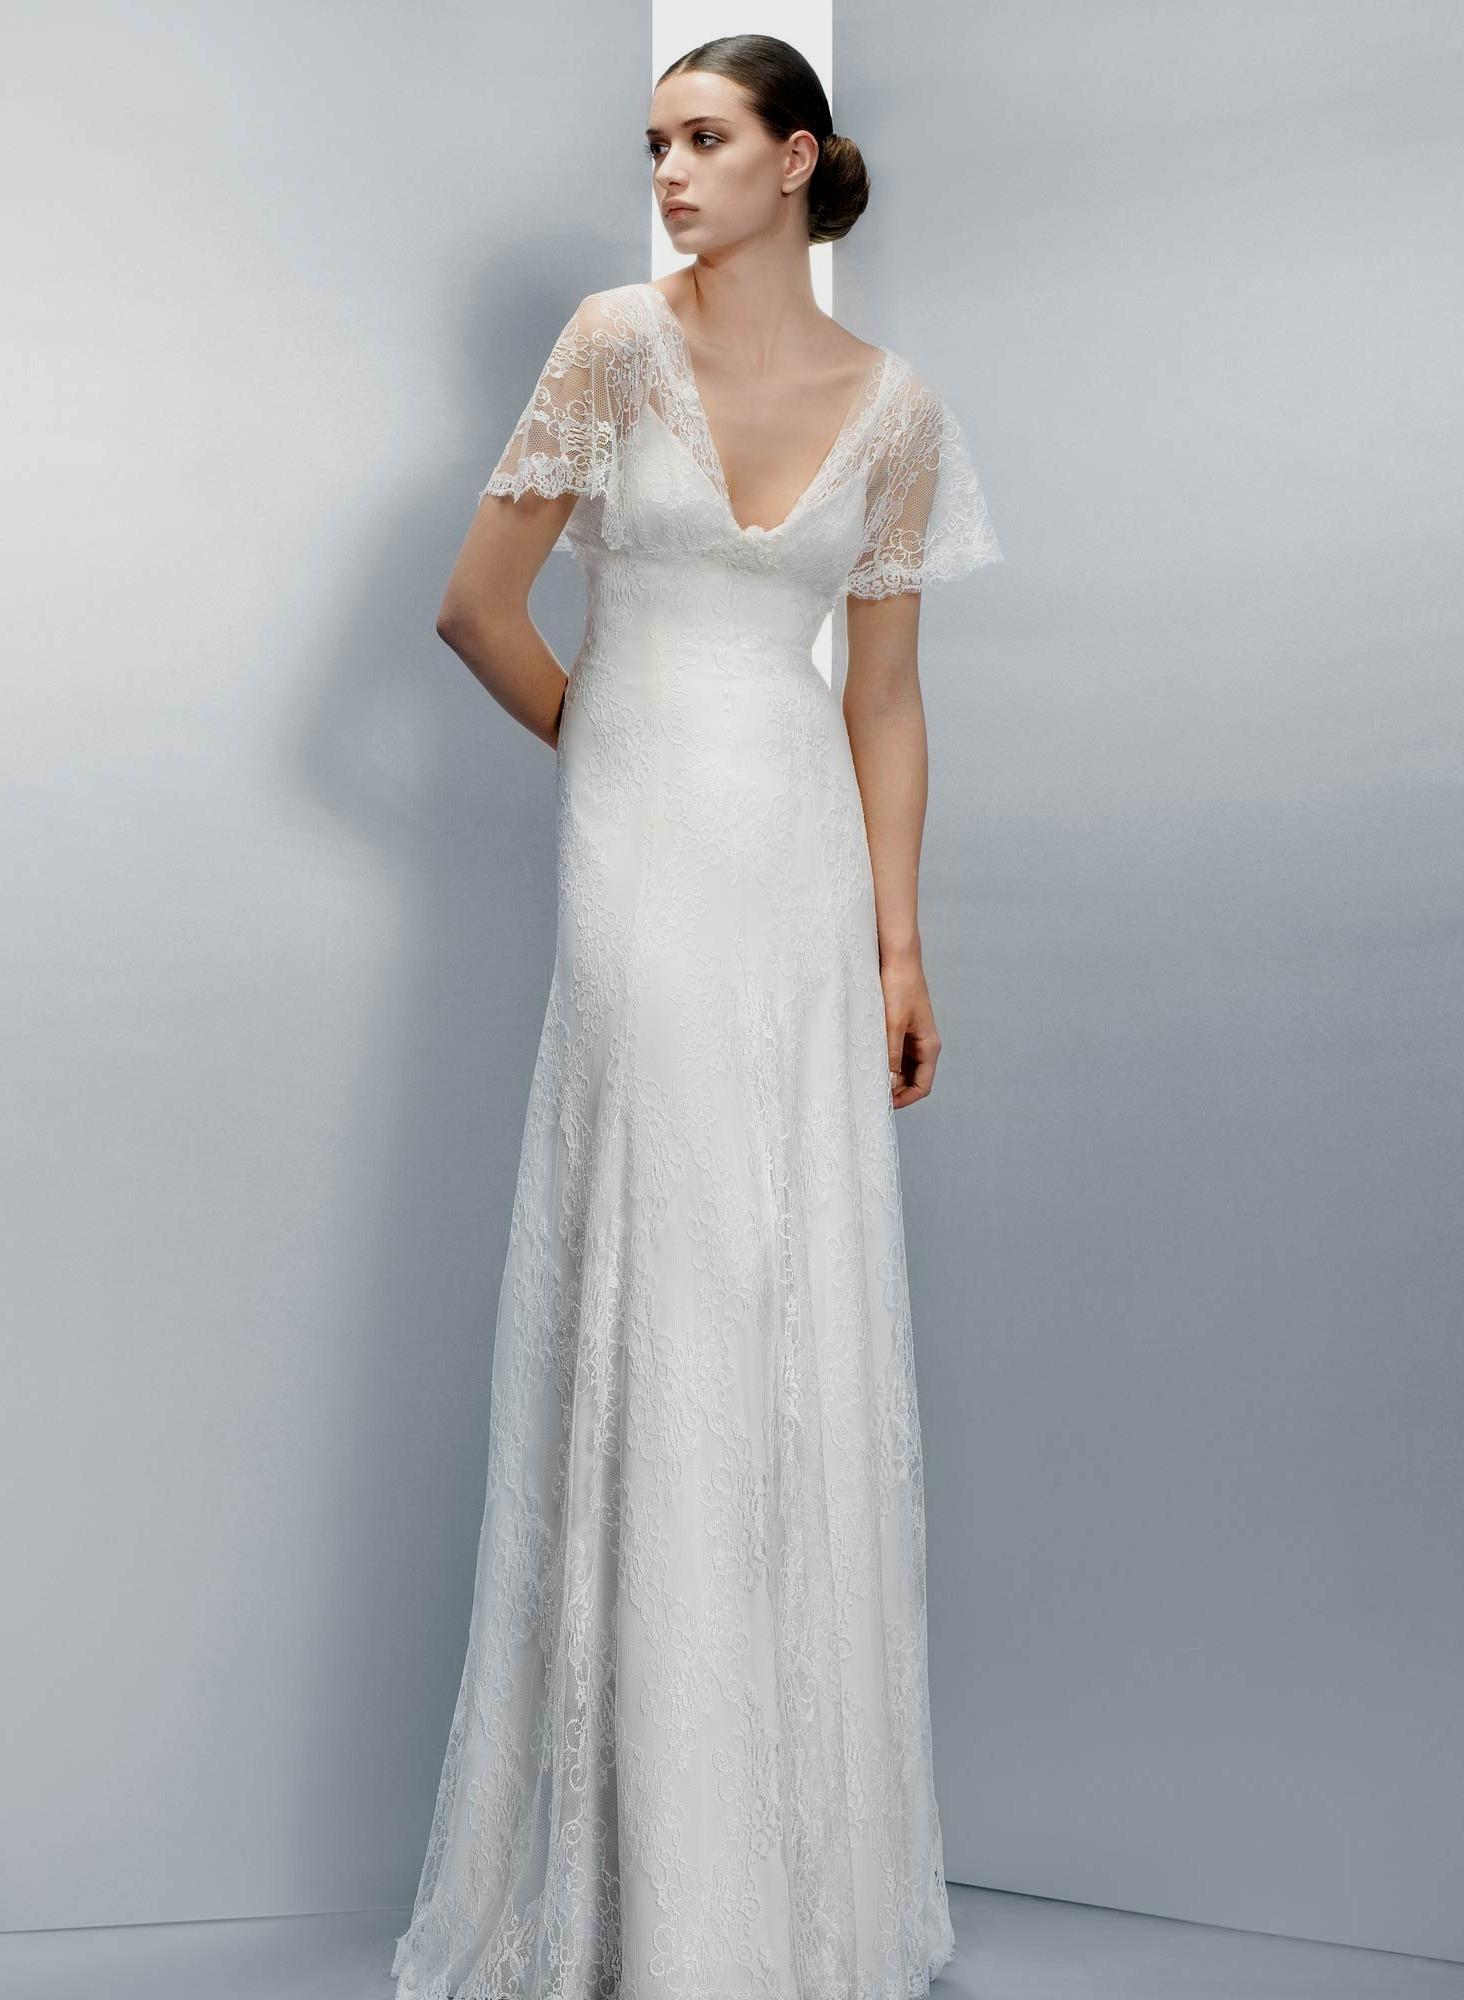 1940 wedding dresses photo - 1